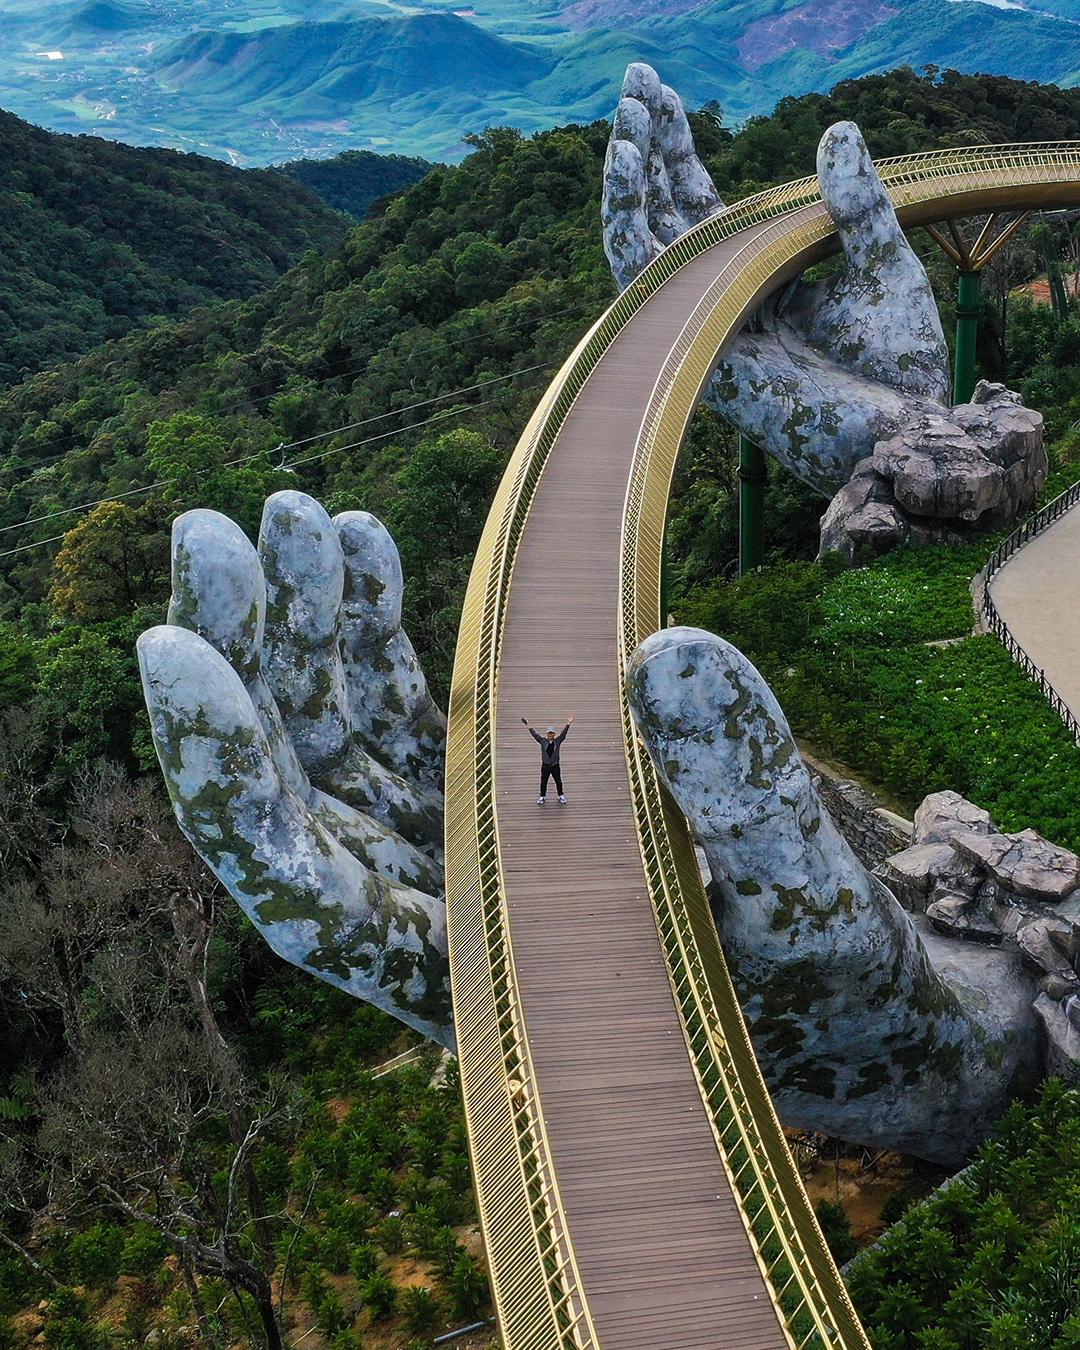 Golden Bridge by Tran Tuan Viet